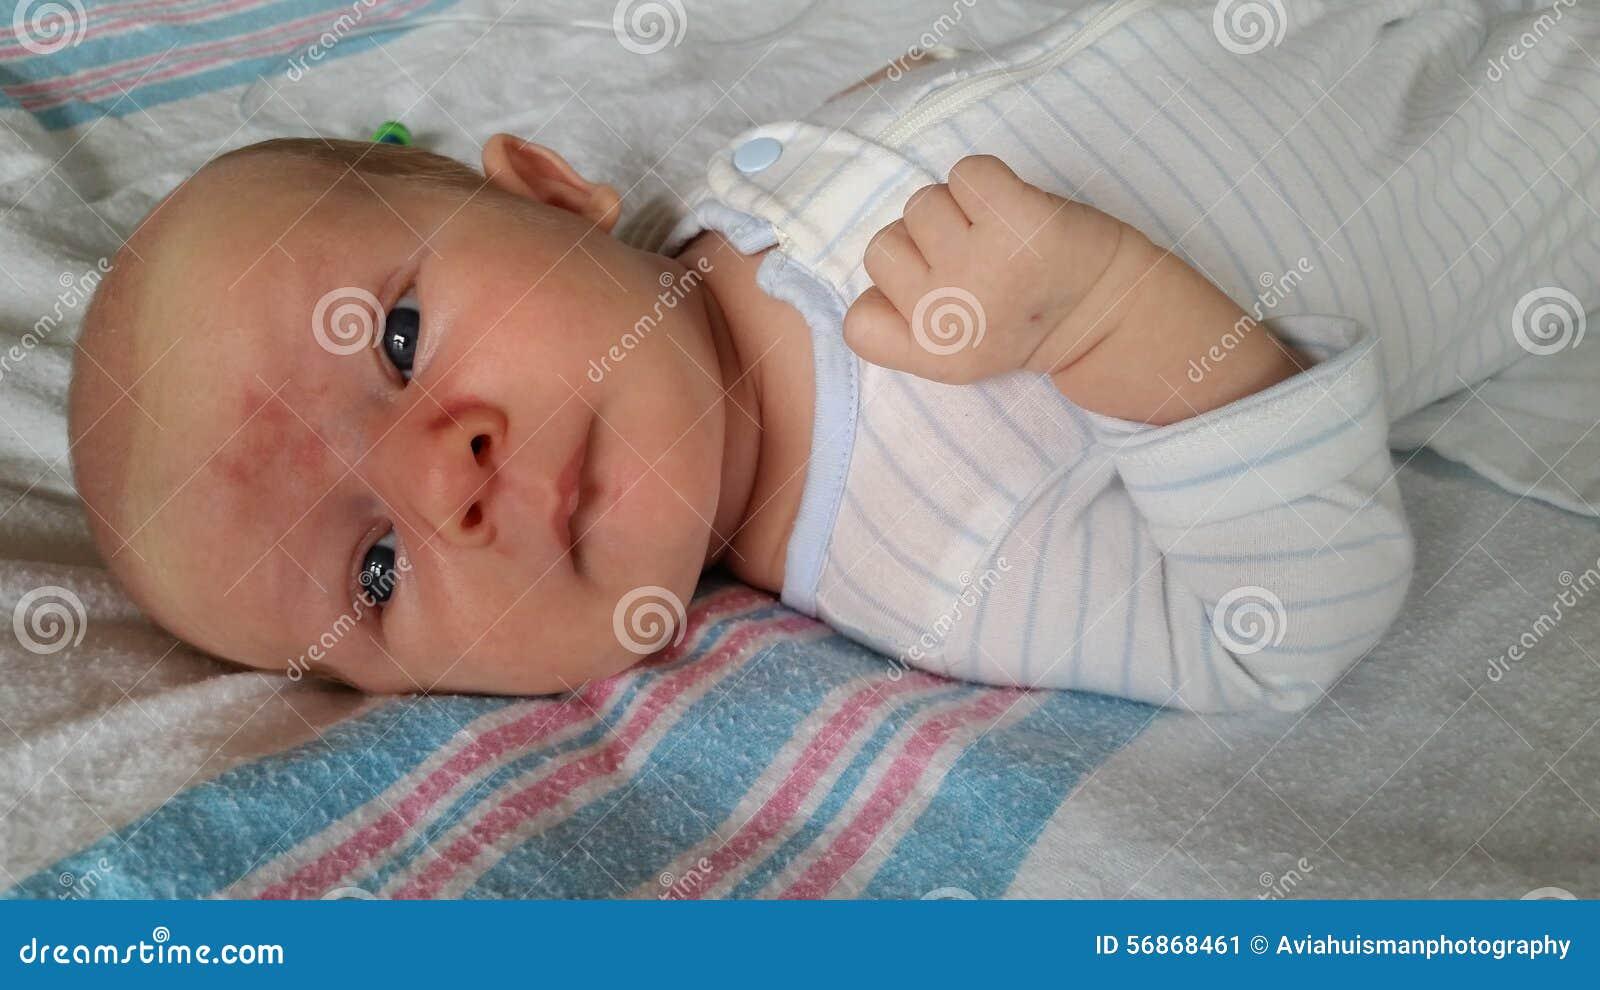 alison angel baby